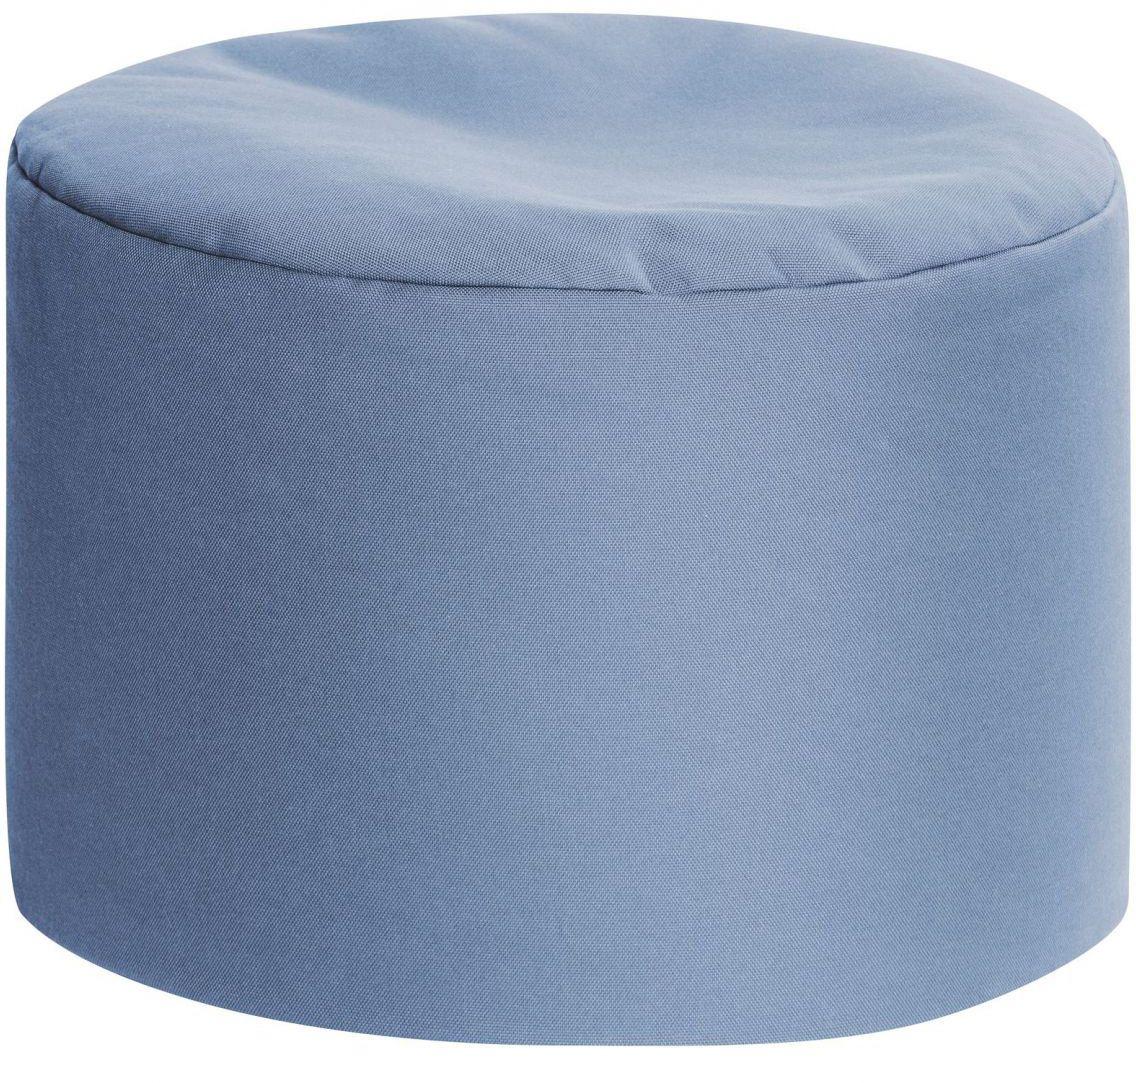 sitting point poef dotcom outside blue